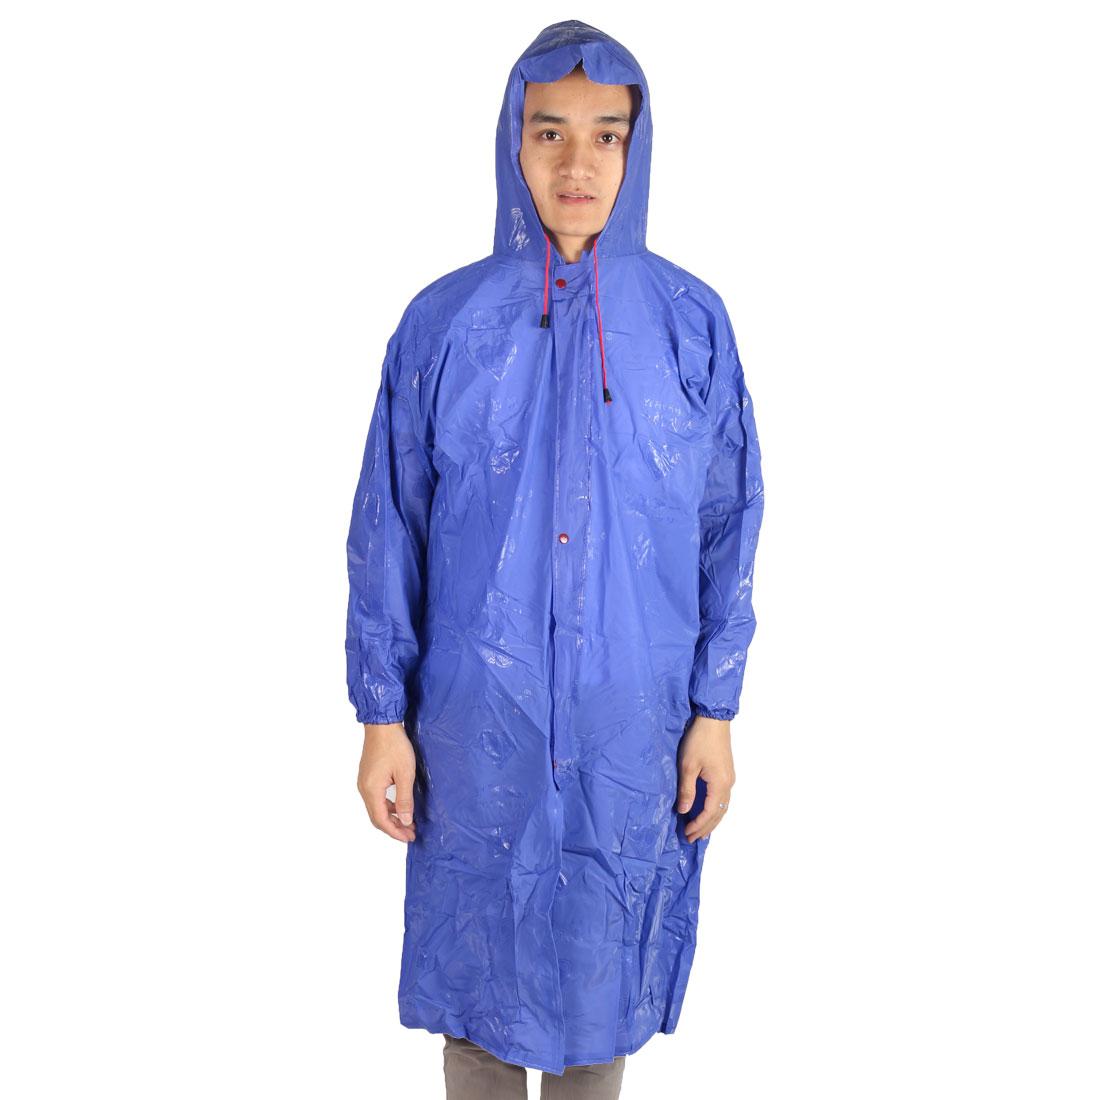 Outdoor Camping Hiking Motorcycle Plastic Water Resistant Dustproof Raincoat Protector Blue